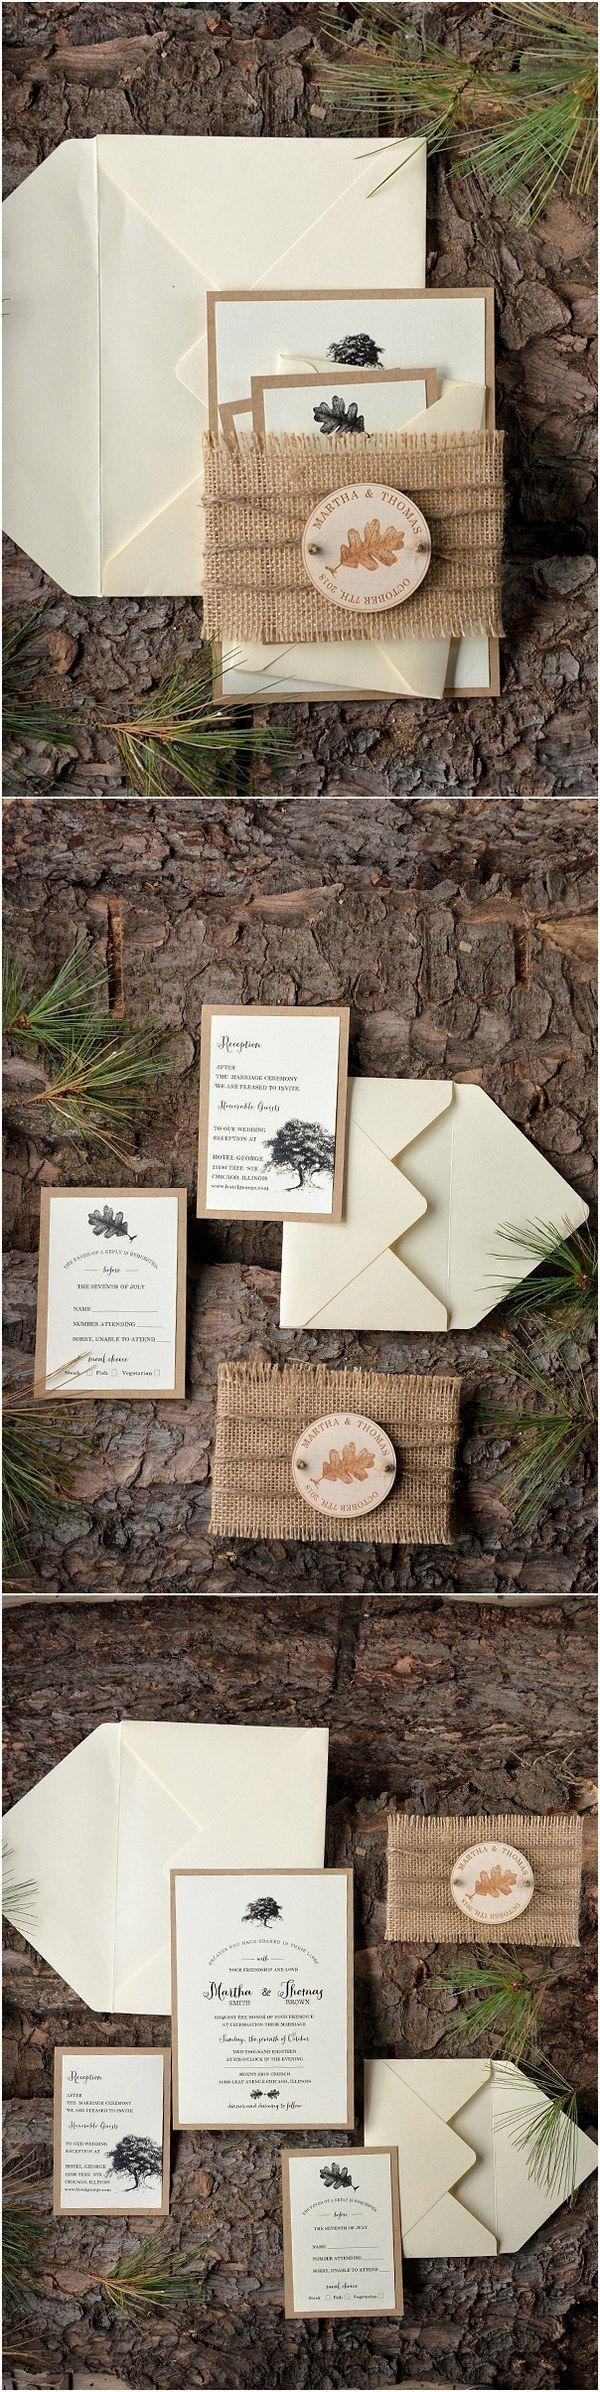 Rustic country burlap wedding invitations @4LOVEPolkaDots